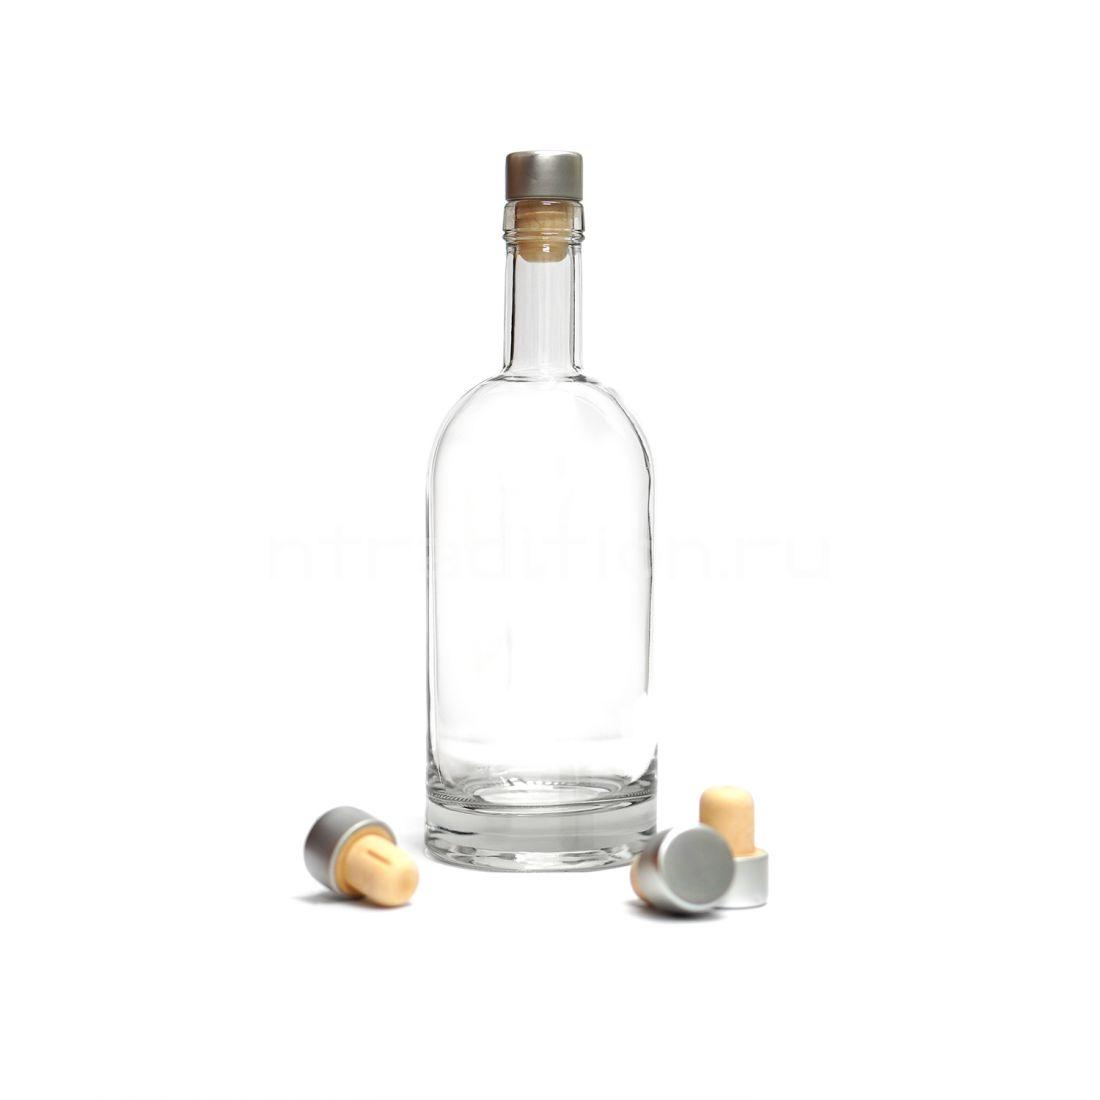 Бутылка Виски Премиум, 0,7 л./ 9 шт.